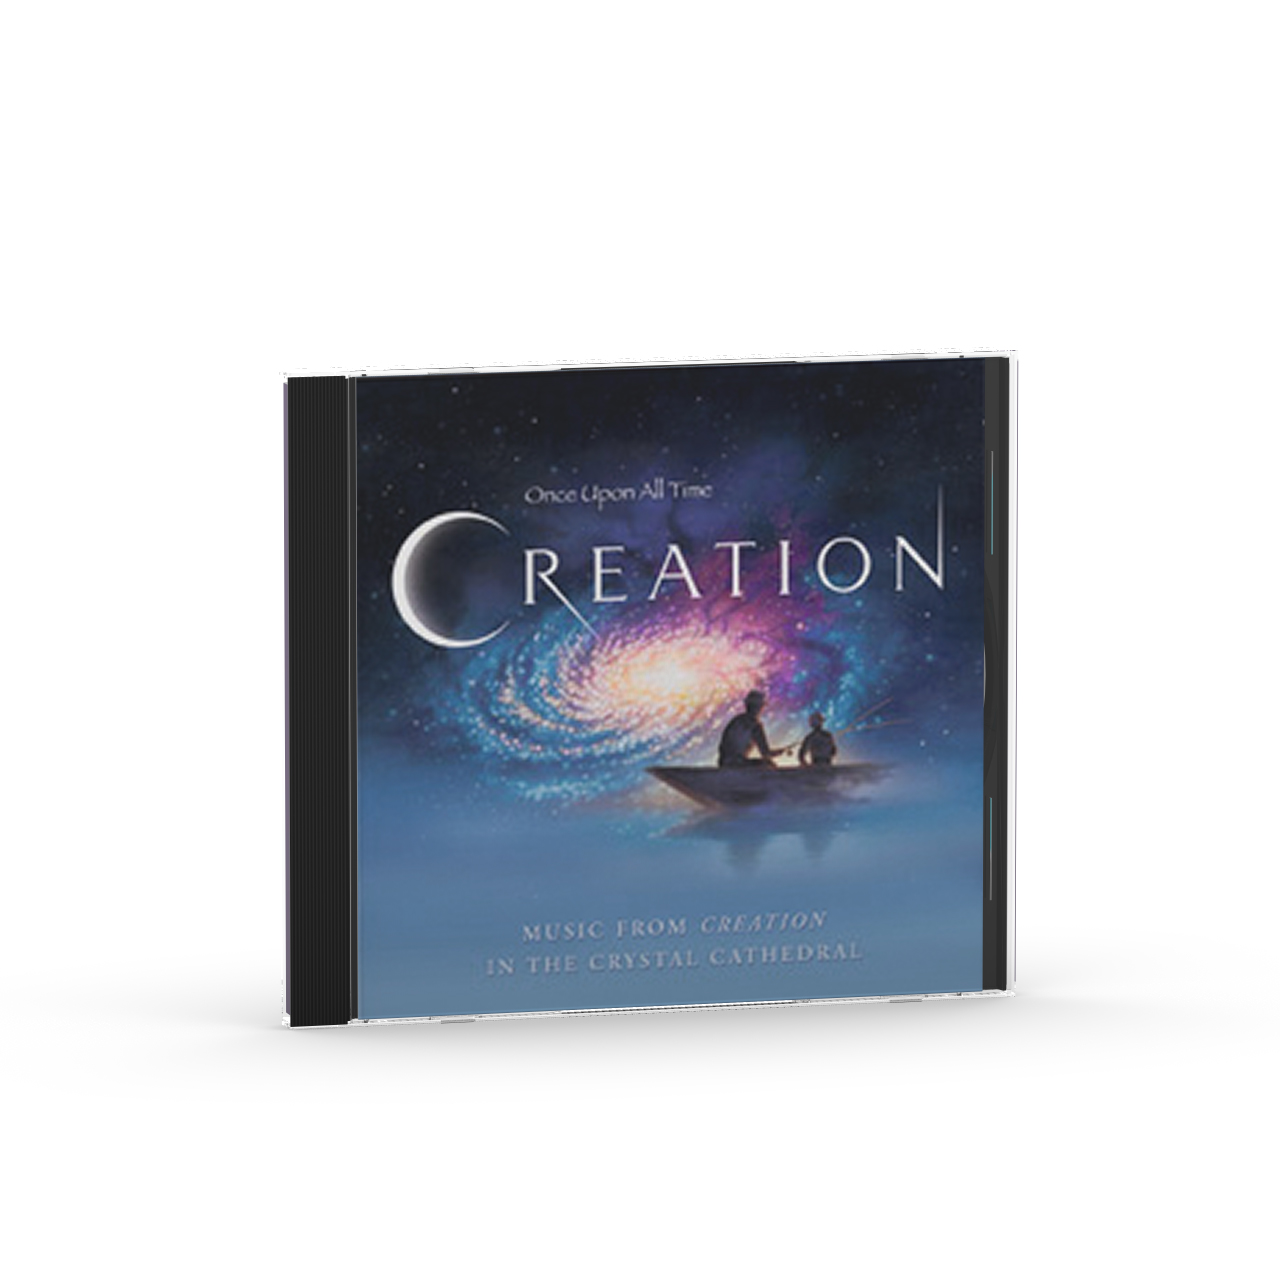 CD: Musical Creation